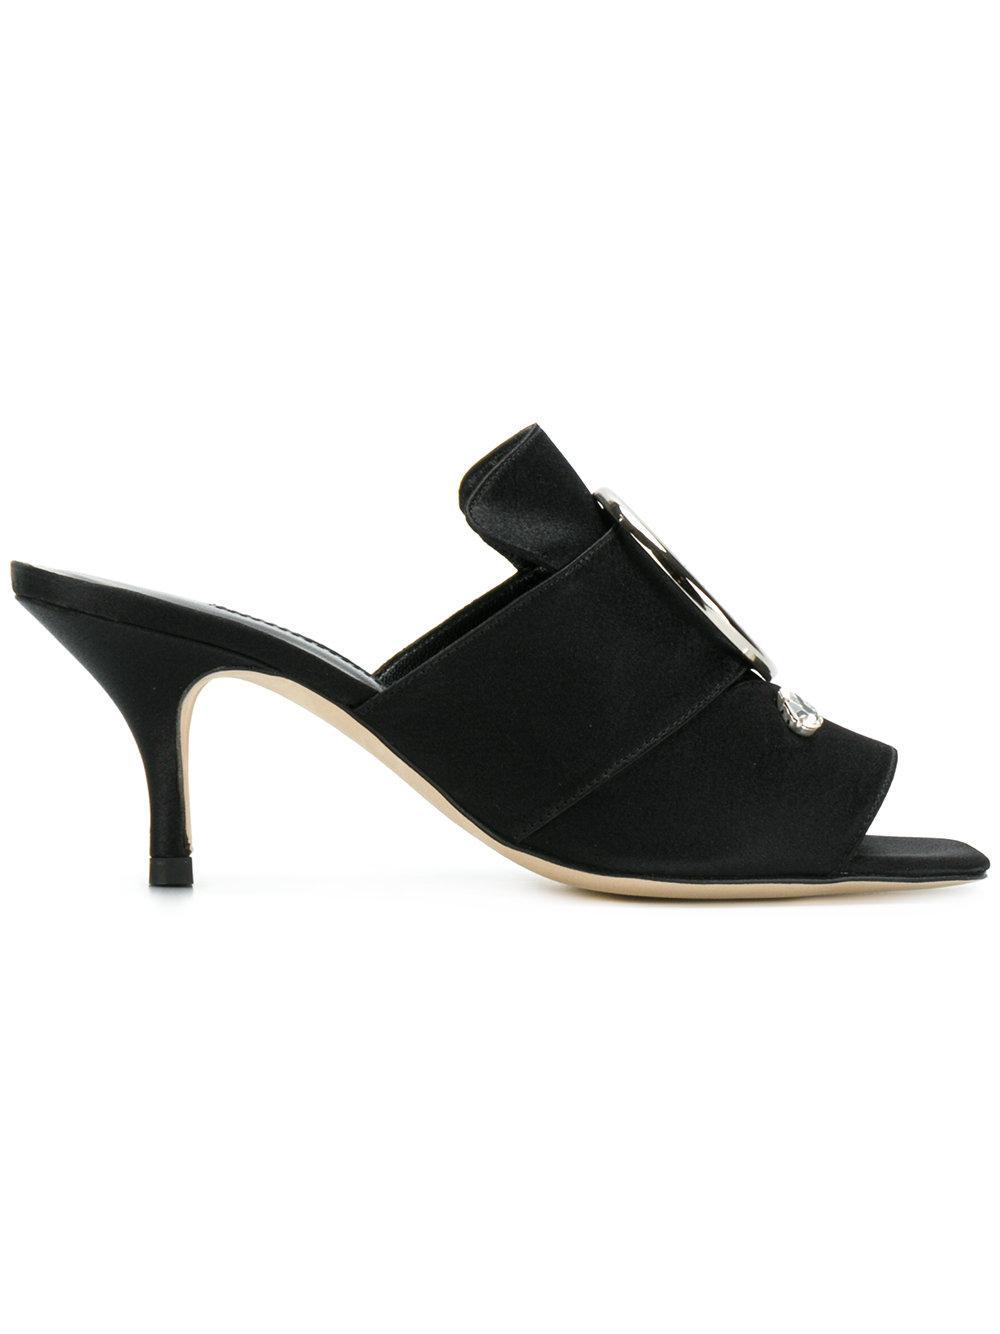 DORATEYMUR Galaxy Leather Sandals 1uXDSx6v